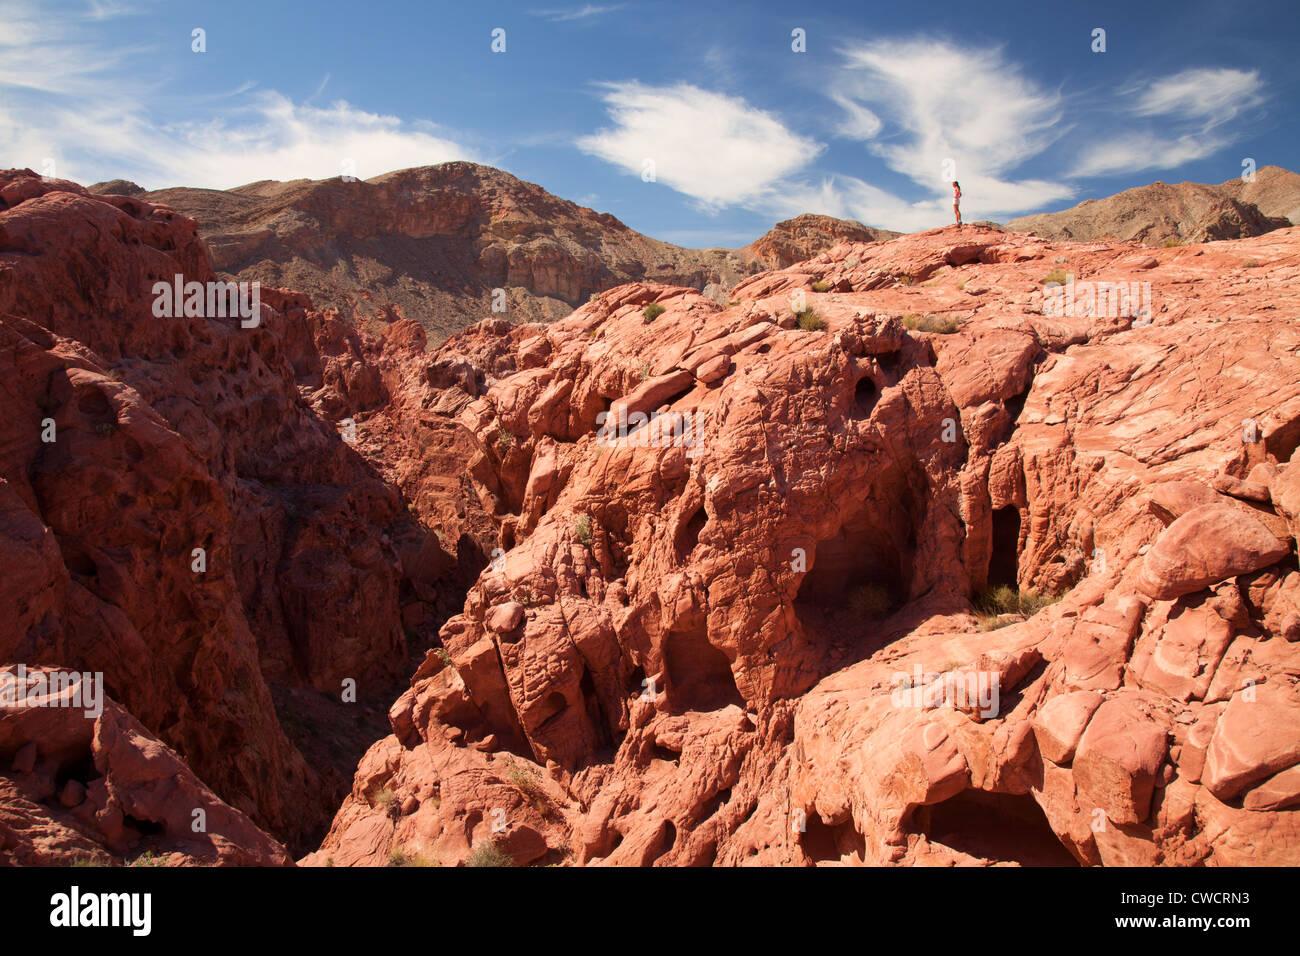 Hiking in Lake Mead National Recreation Area, near Las Vegas, Nevada. (Model Released) Stock Photo